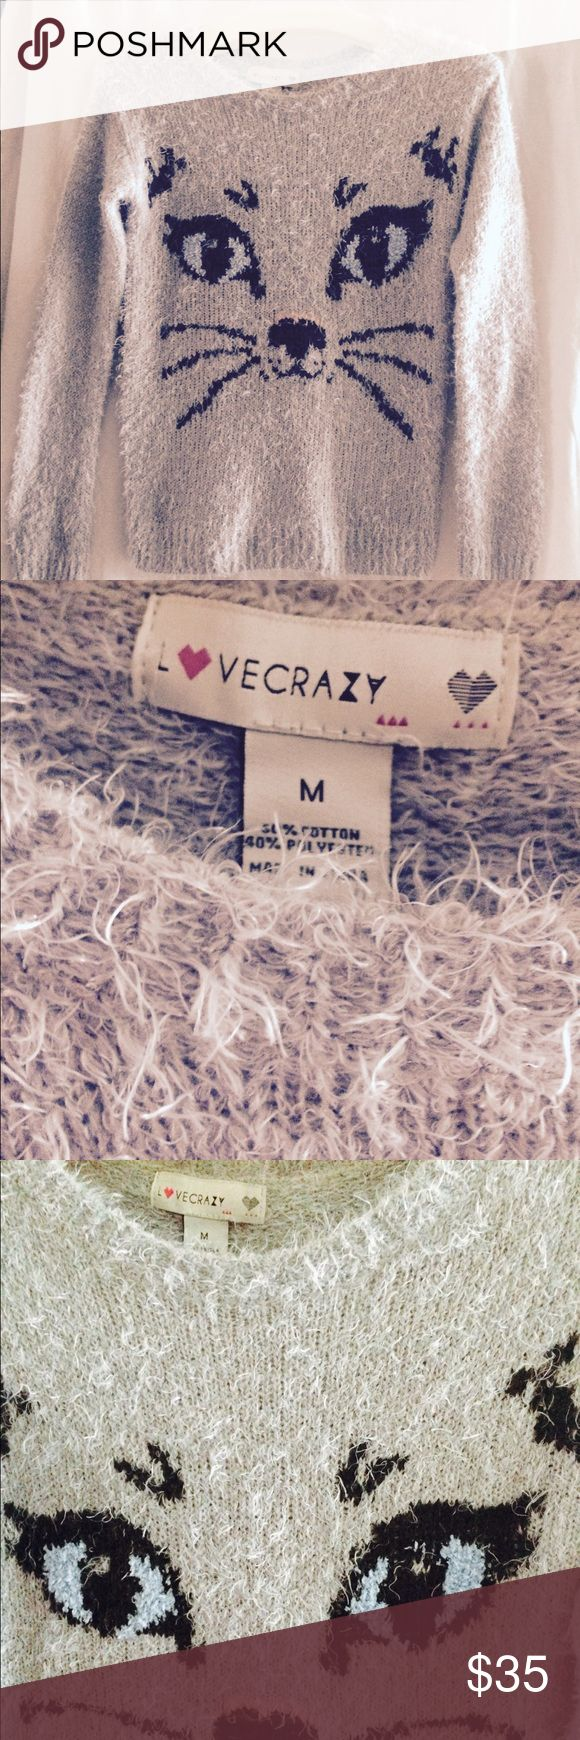 Kitty Kat cashmere blend sweater Love Crazy Love Crazy brand. Size M. Brand new. Cutest Kitty Kat print. Love Crazy Sweaters Crew & Scoop Necks